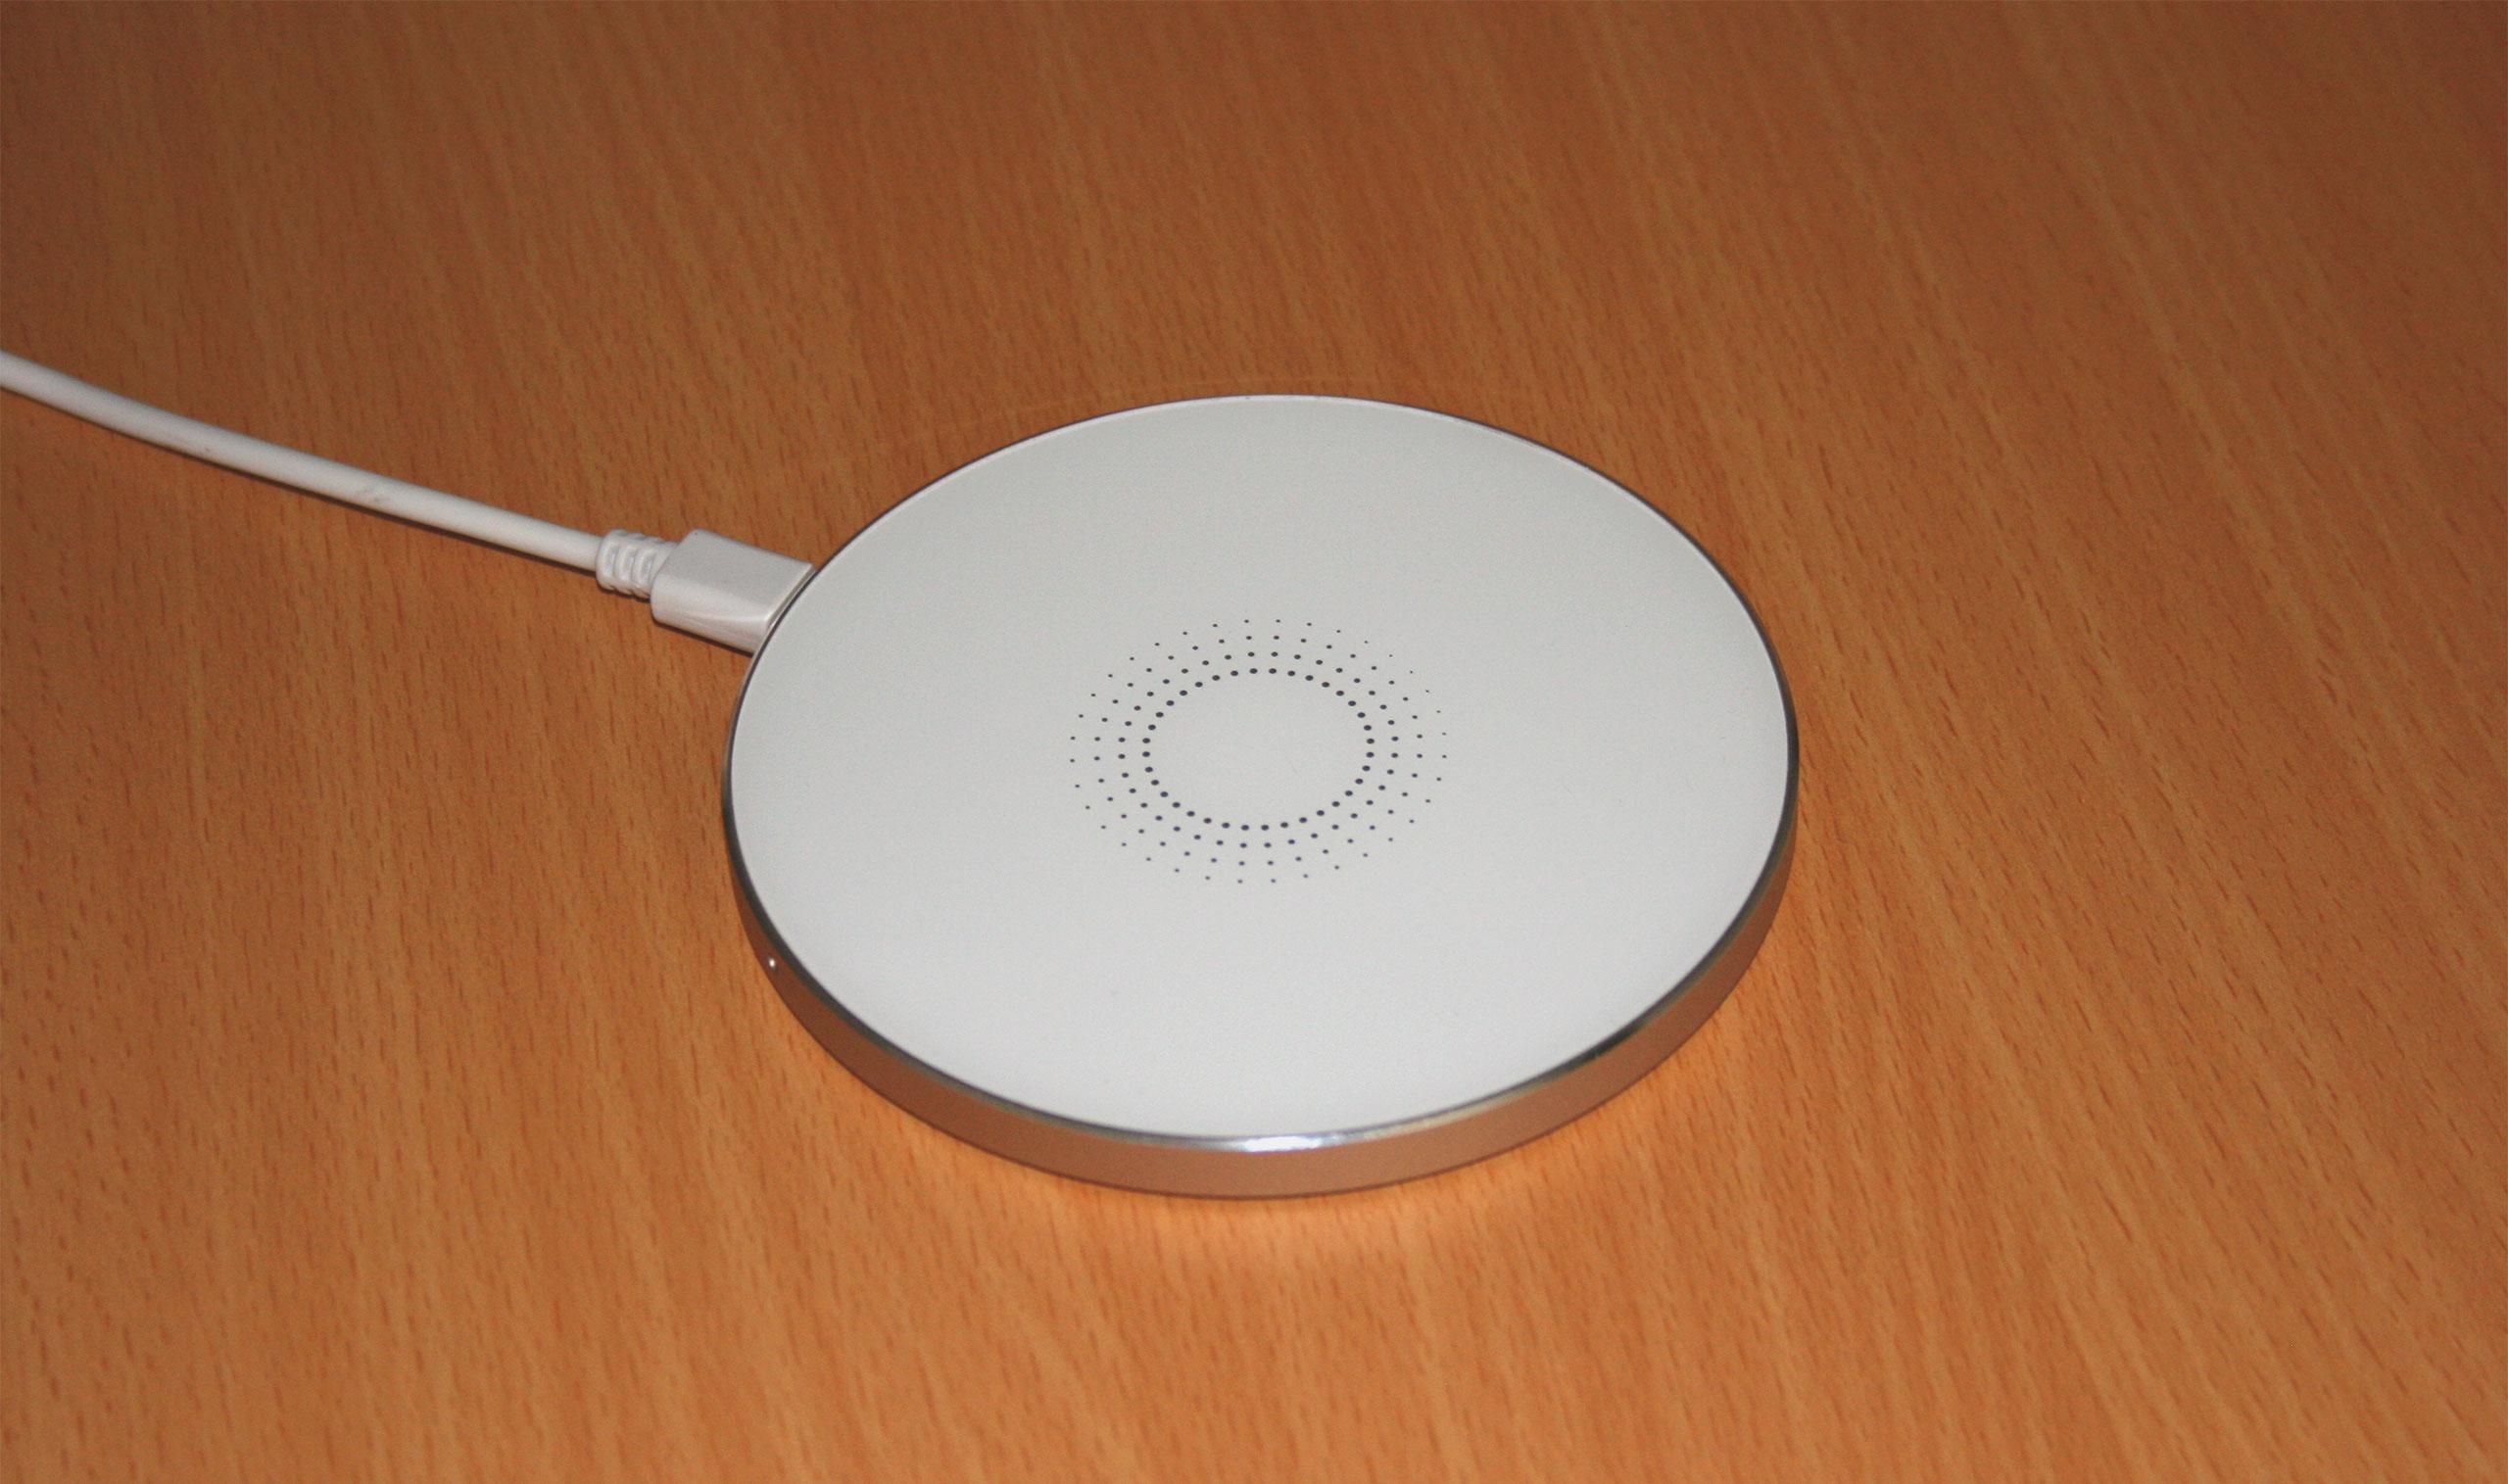 glowstone-heated-smart-mug-fine-bone-china-charger